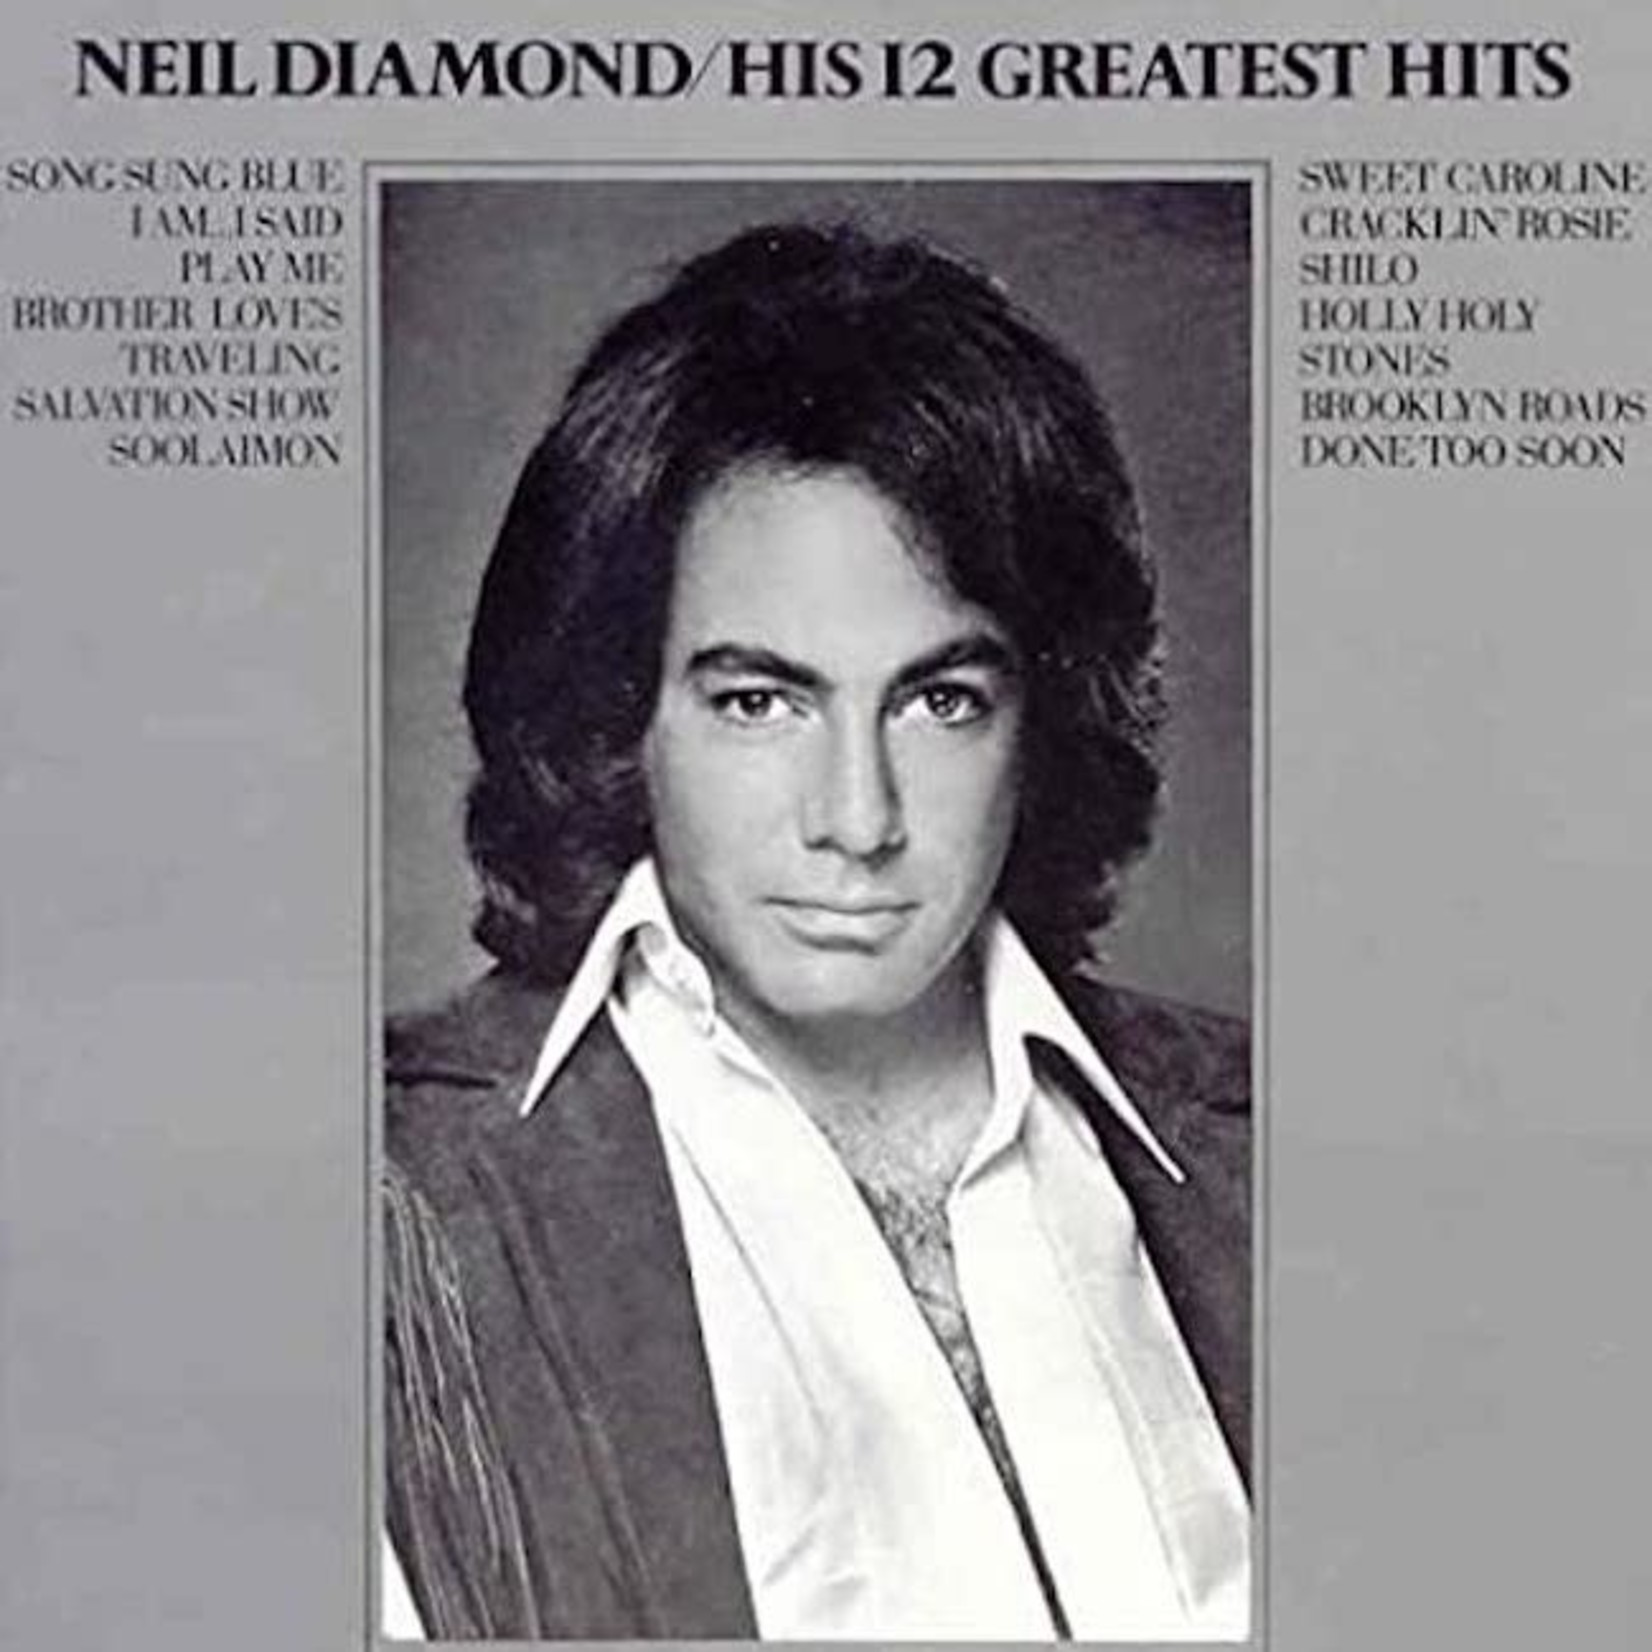 [Vintage] Diamond, Neil: 12 Greatest Hits Vol. 1 (or His...)